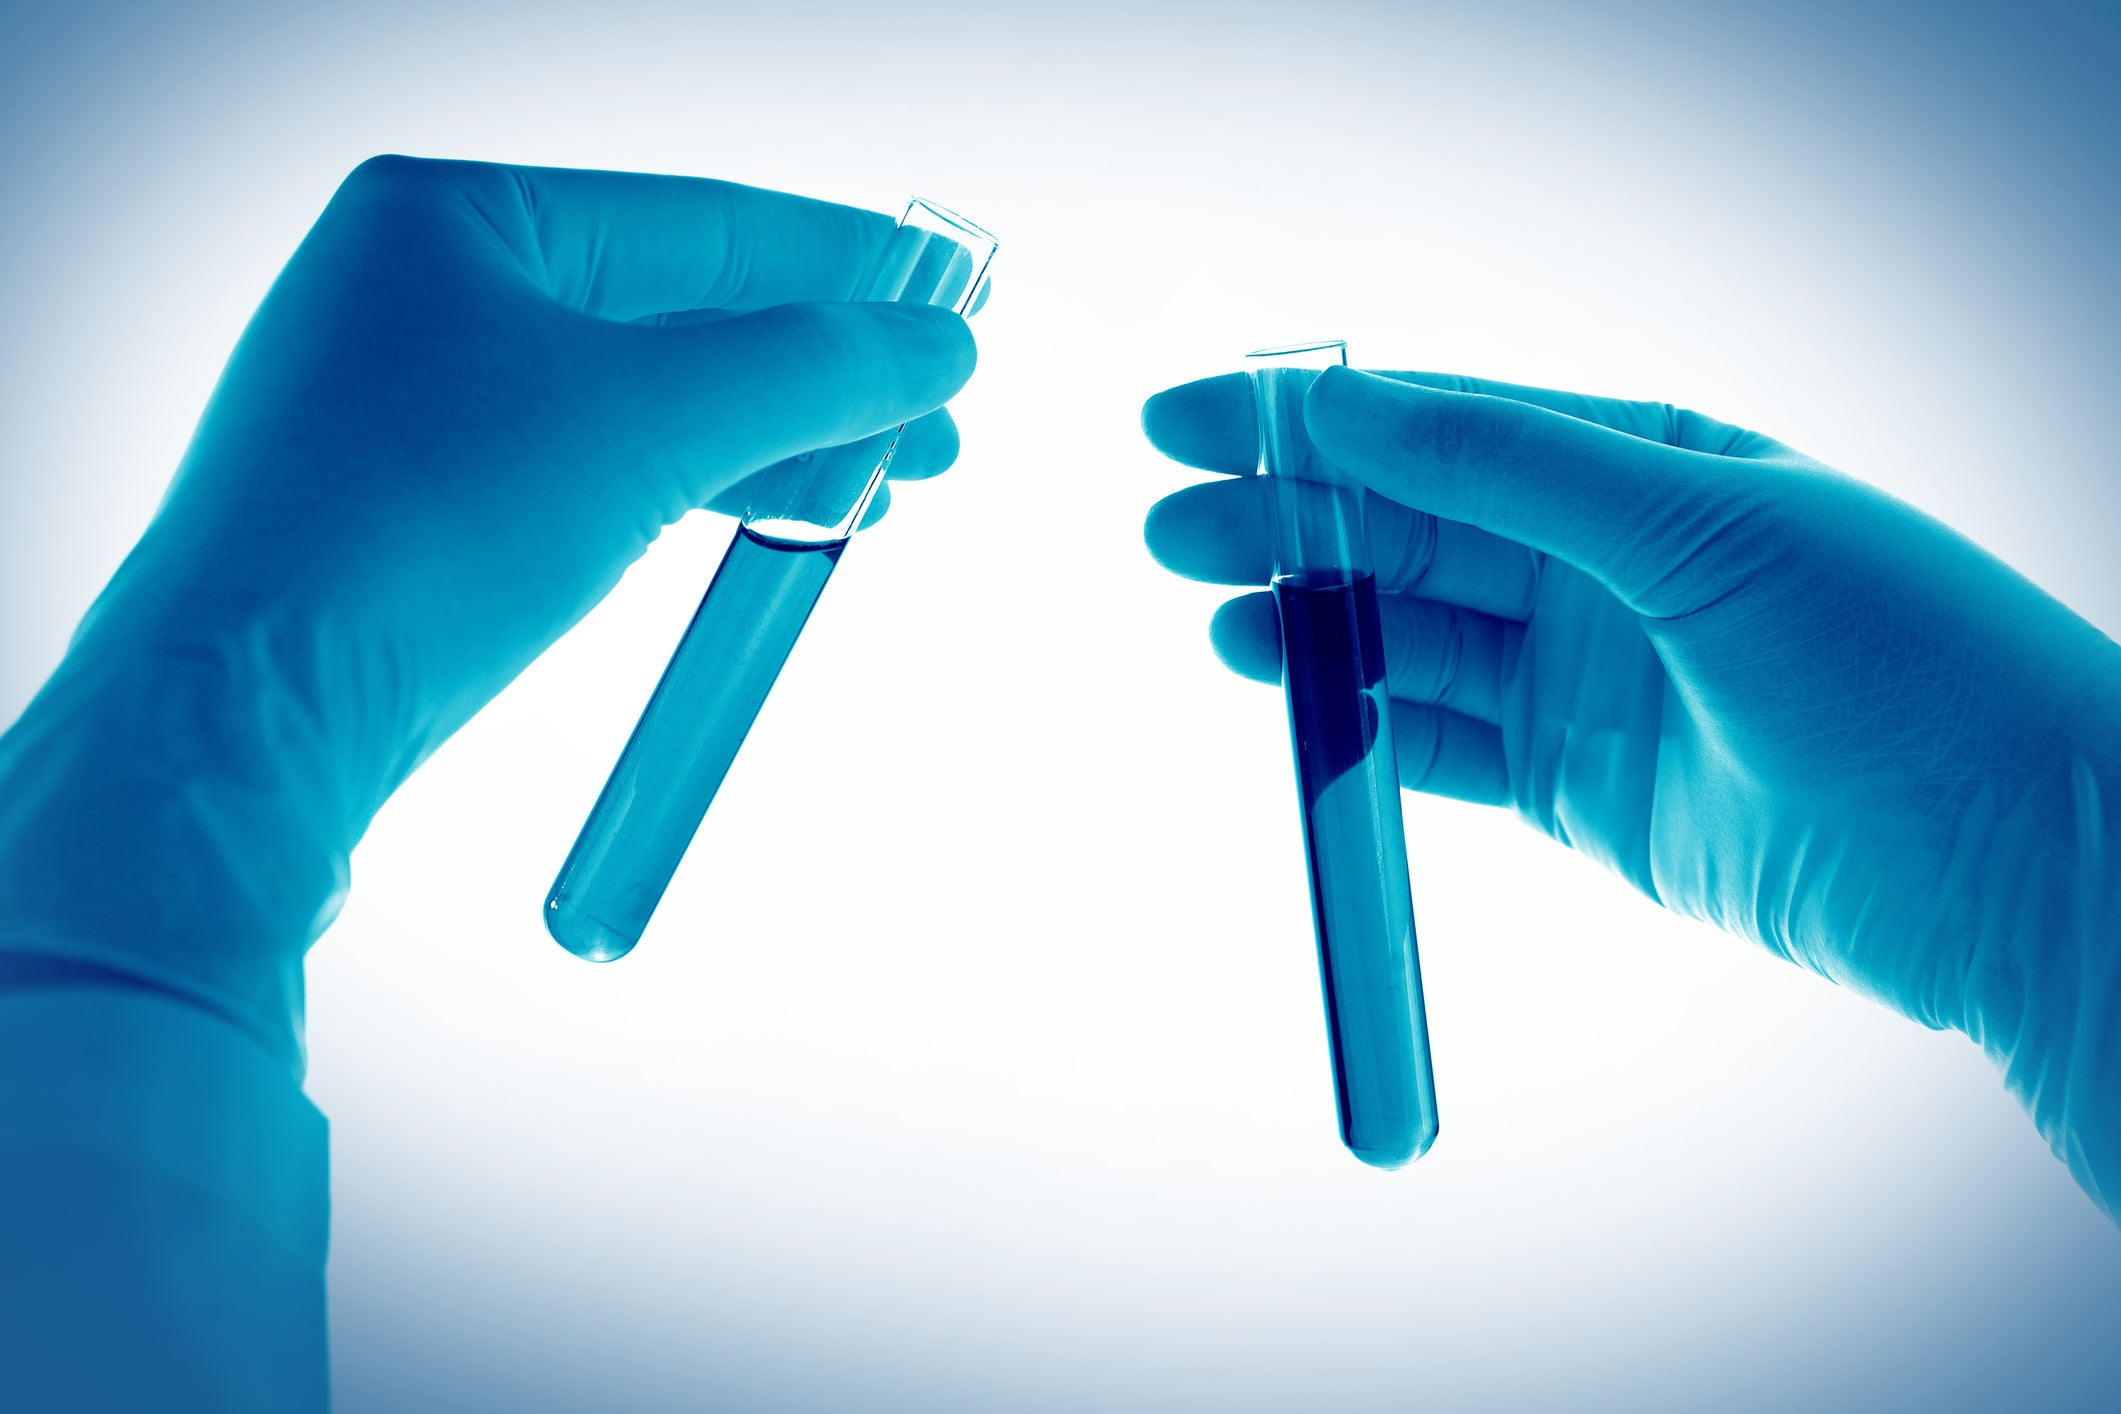 Better Buy: Intercept Pharmaceuticals vs. Gilead Sciences